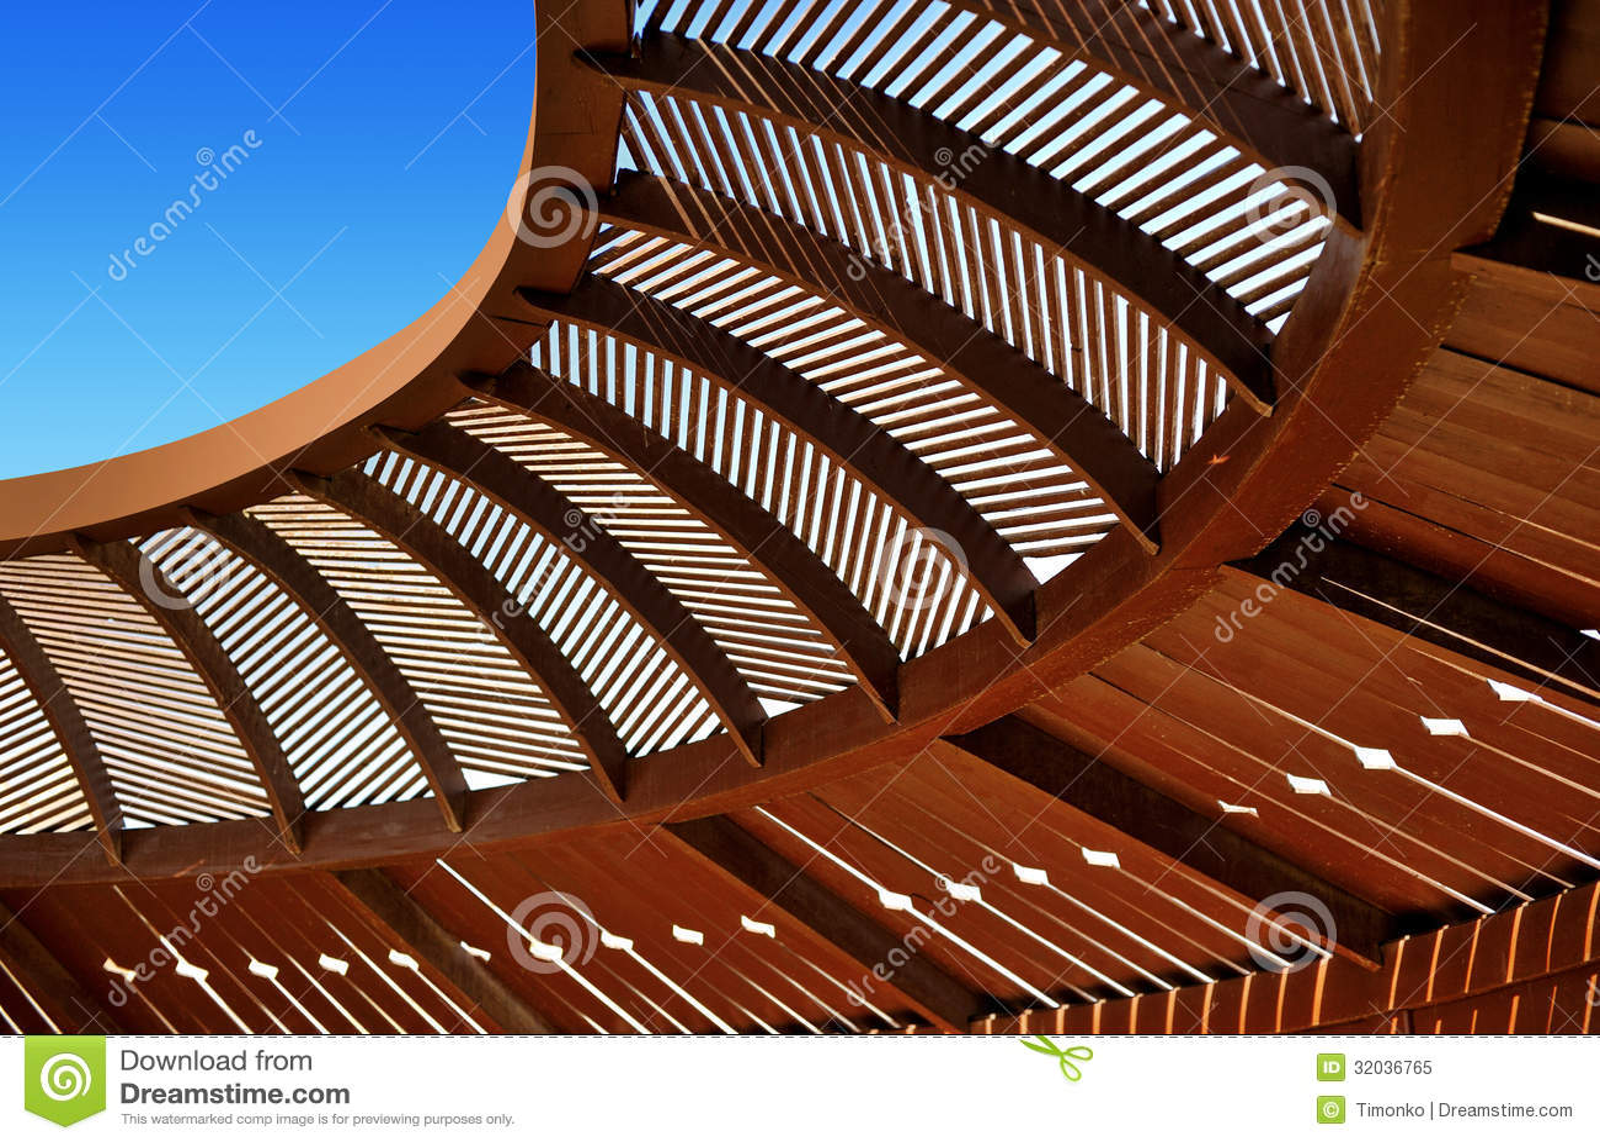 Wooden ceiling gazebo stock image image of light beam for Techos redondos fotos